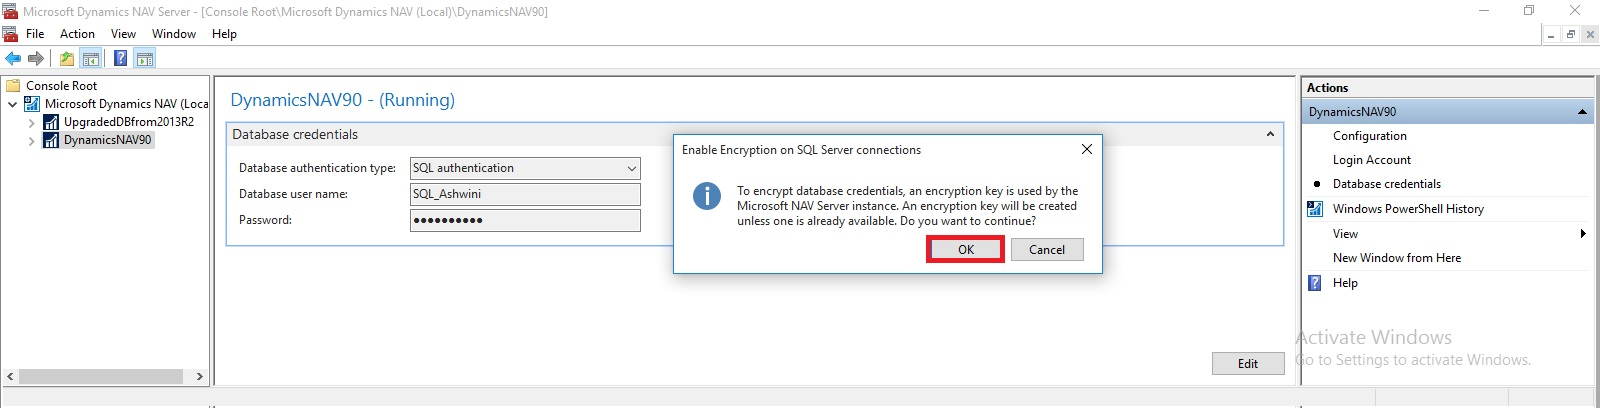 SQLServerAuthentication6